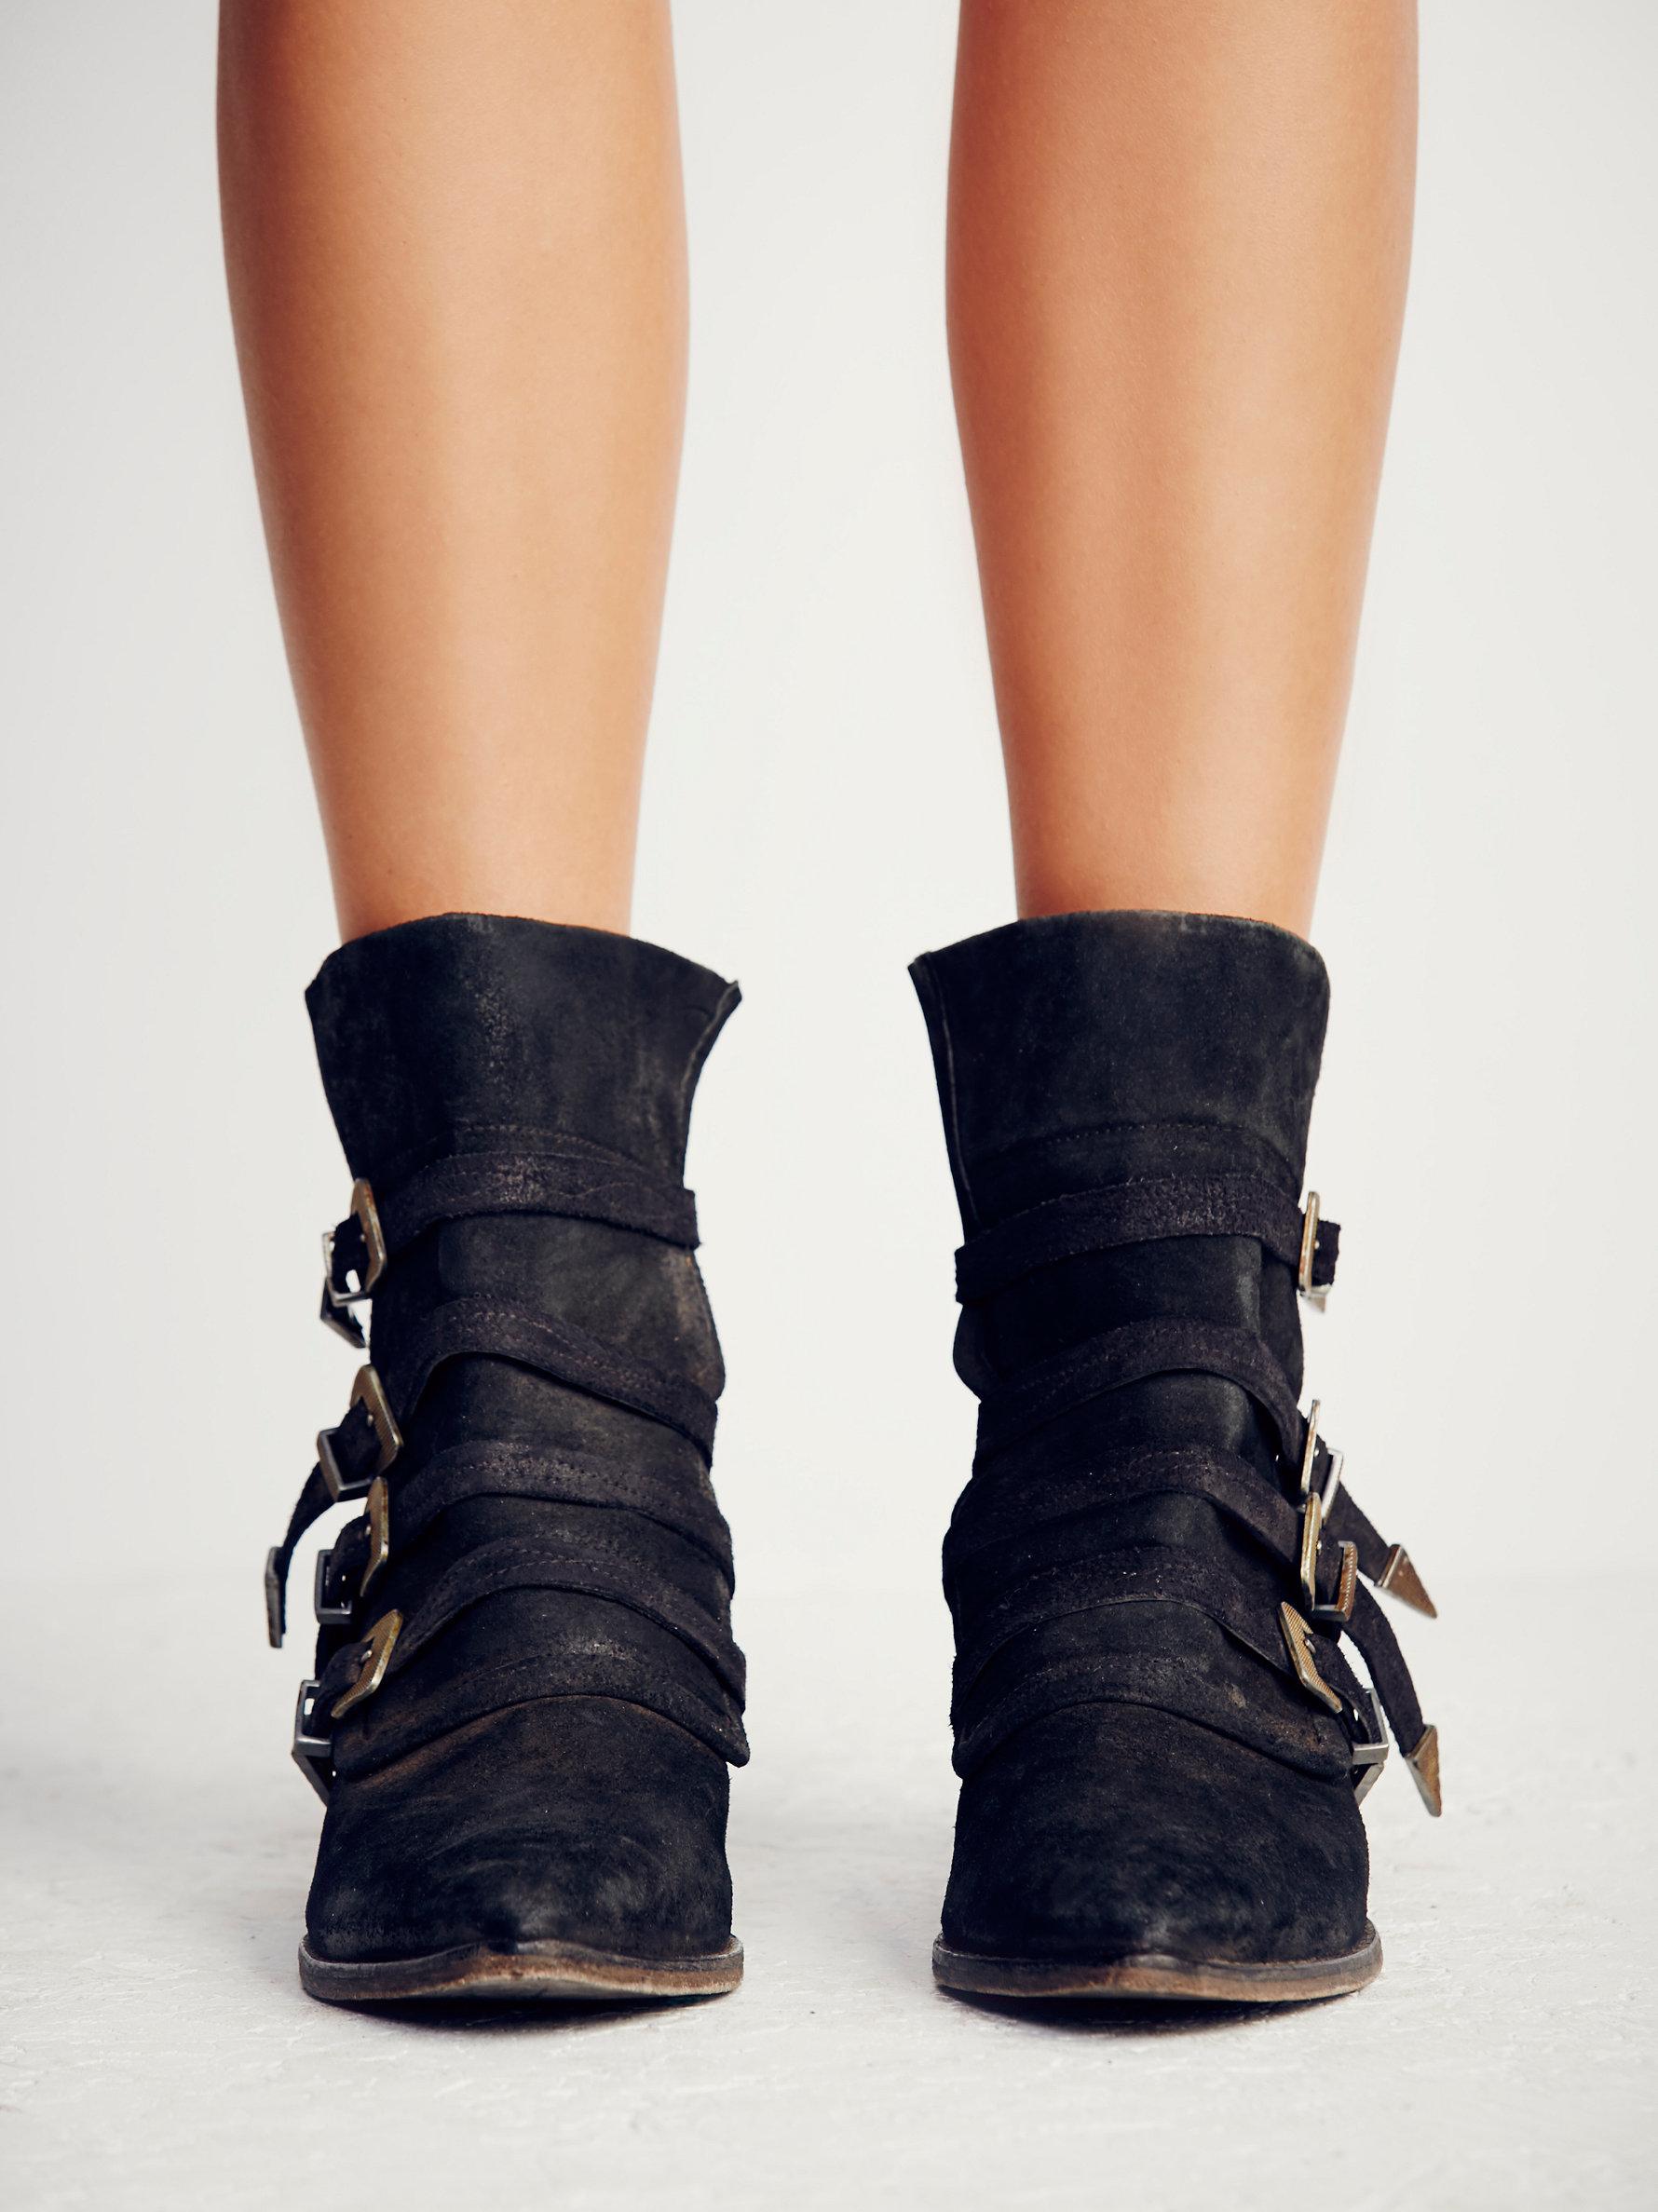 Nasty Gal Shoes Sizing